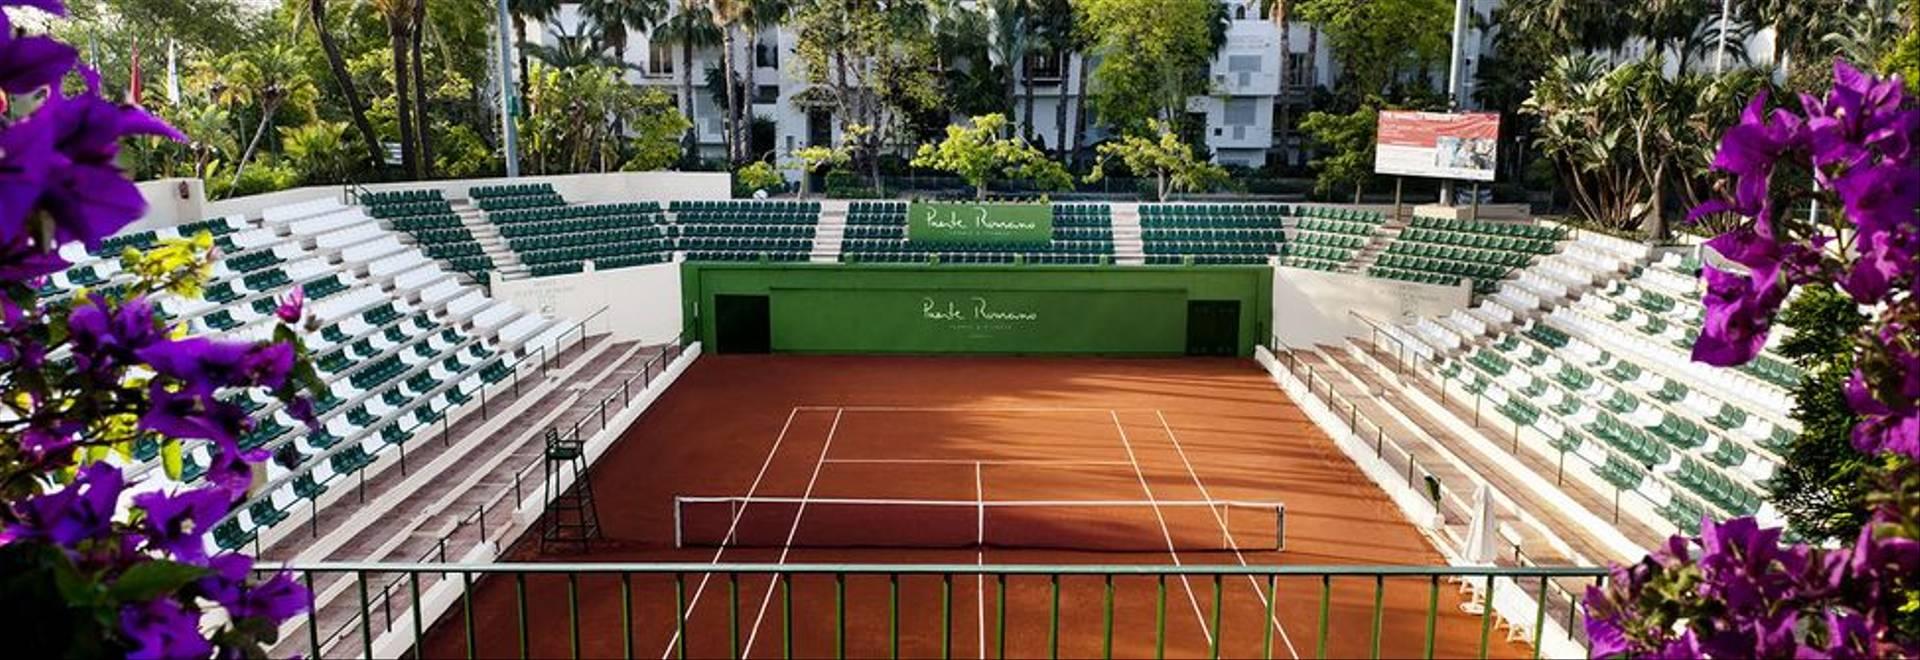 Marbella-Club-tennis-court.jpg